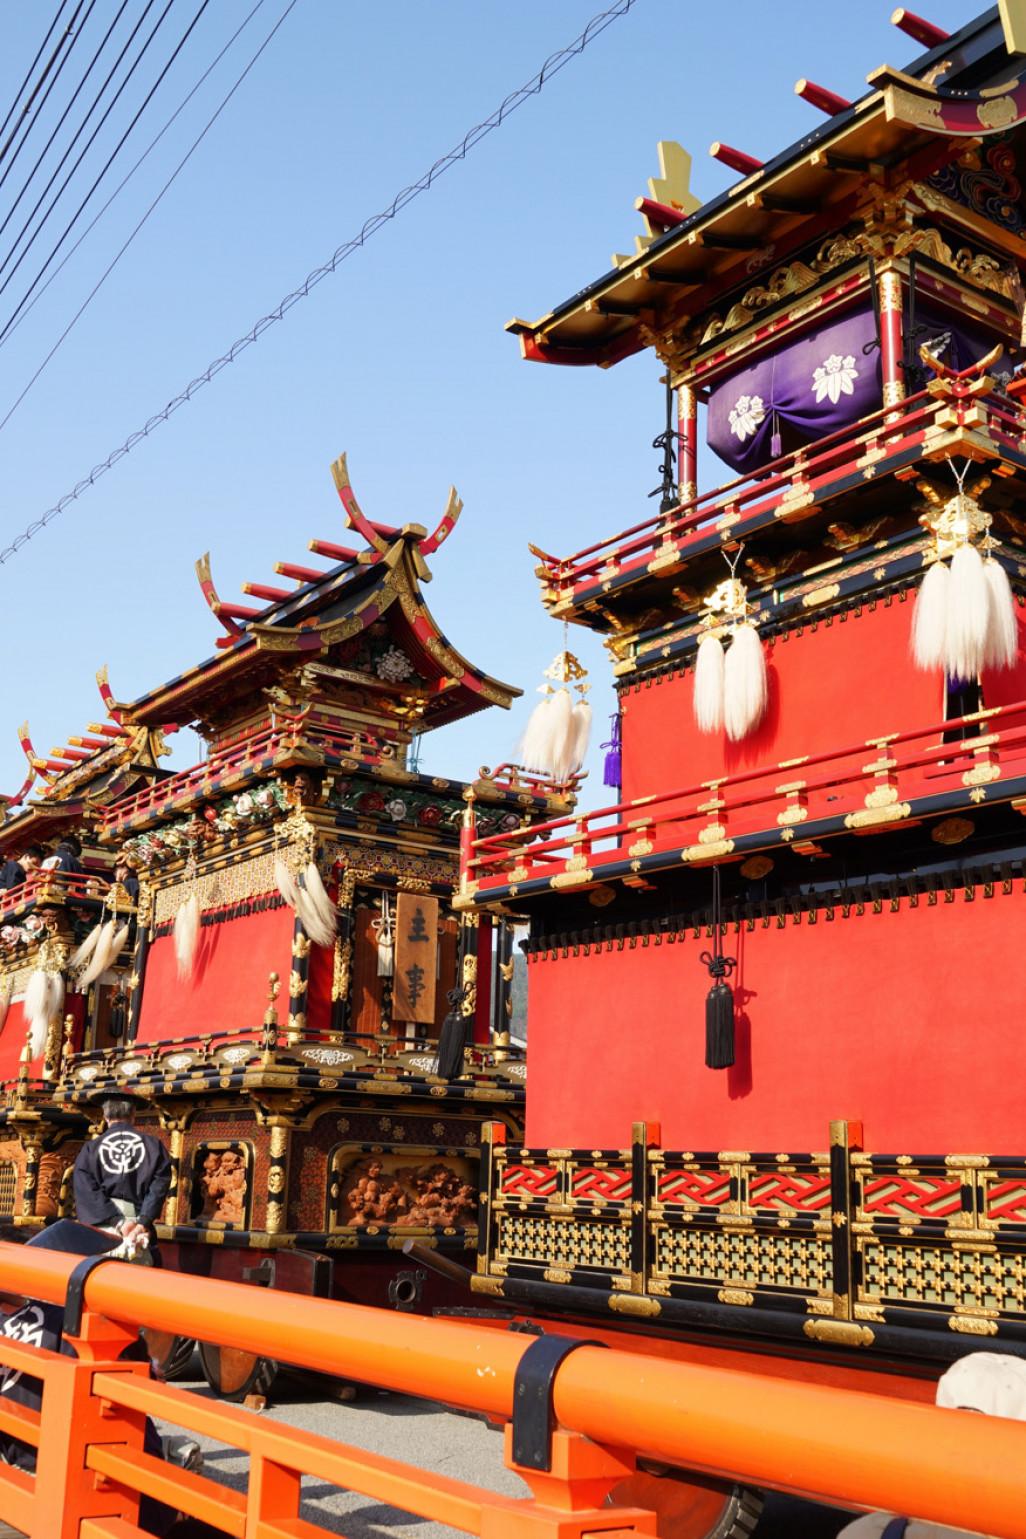 Hida's Heritage & Traditions